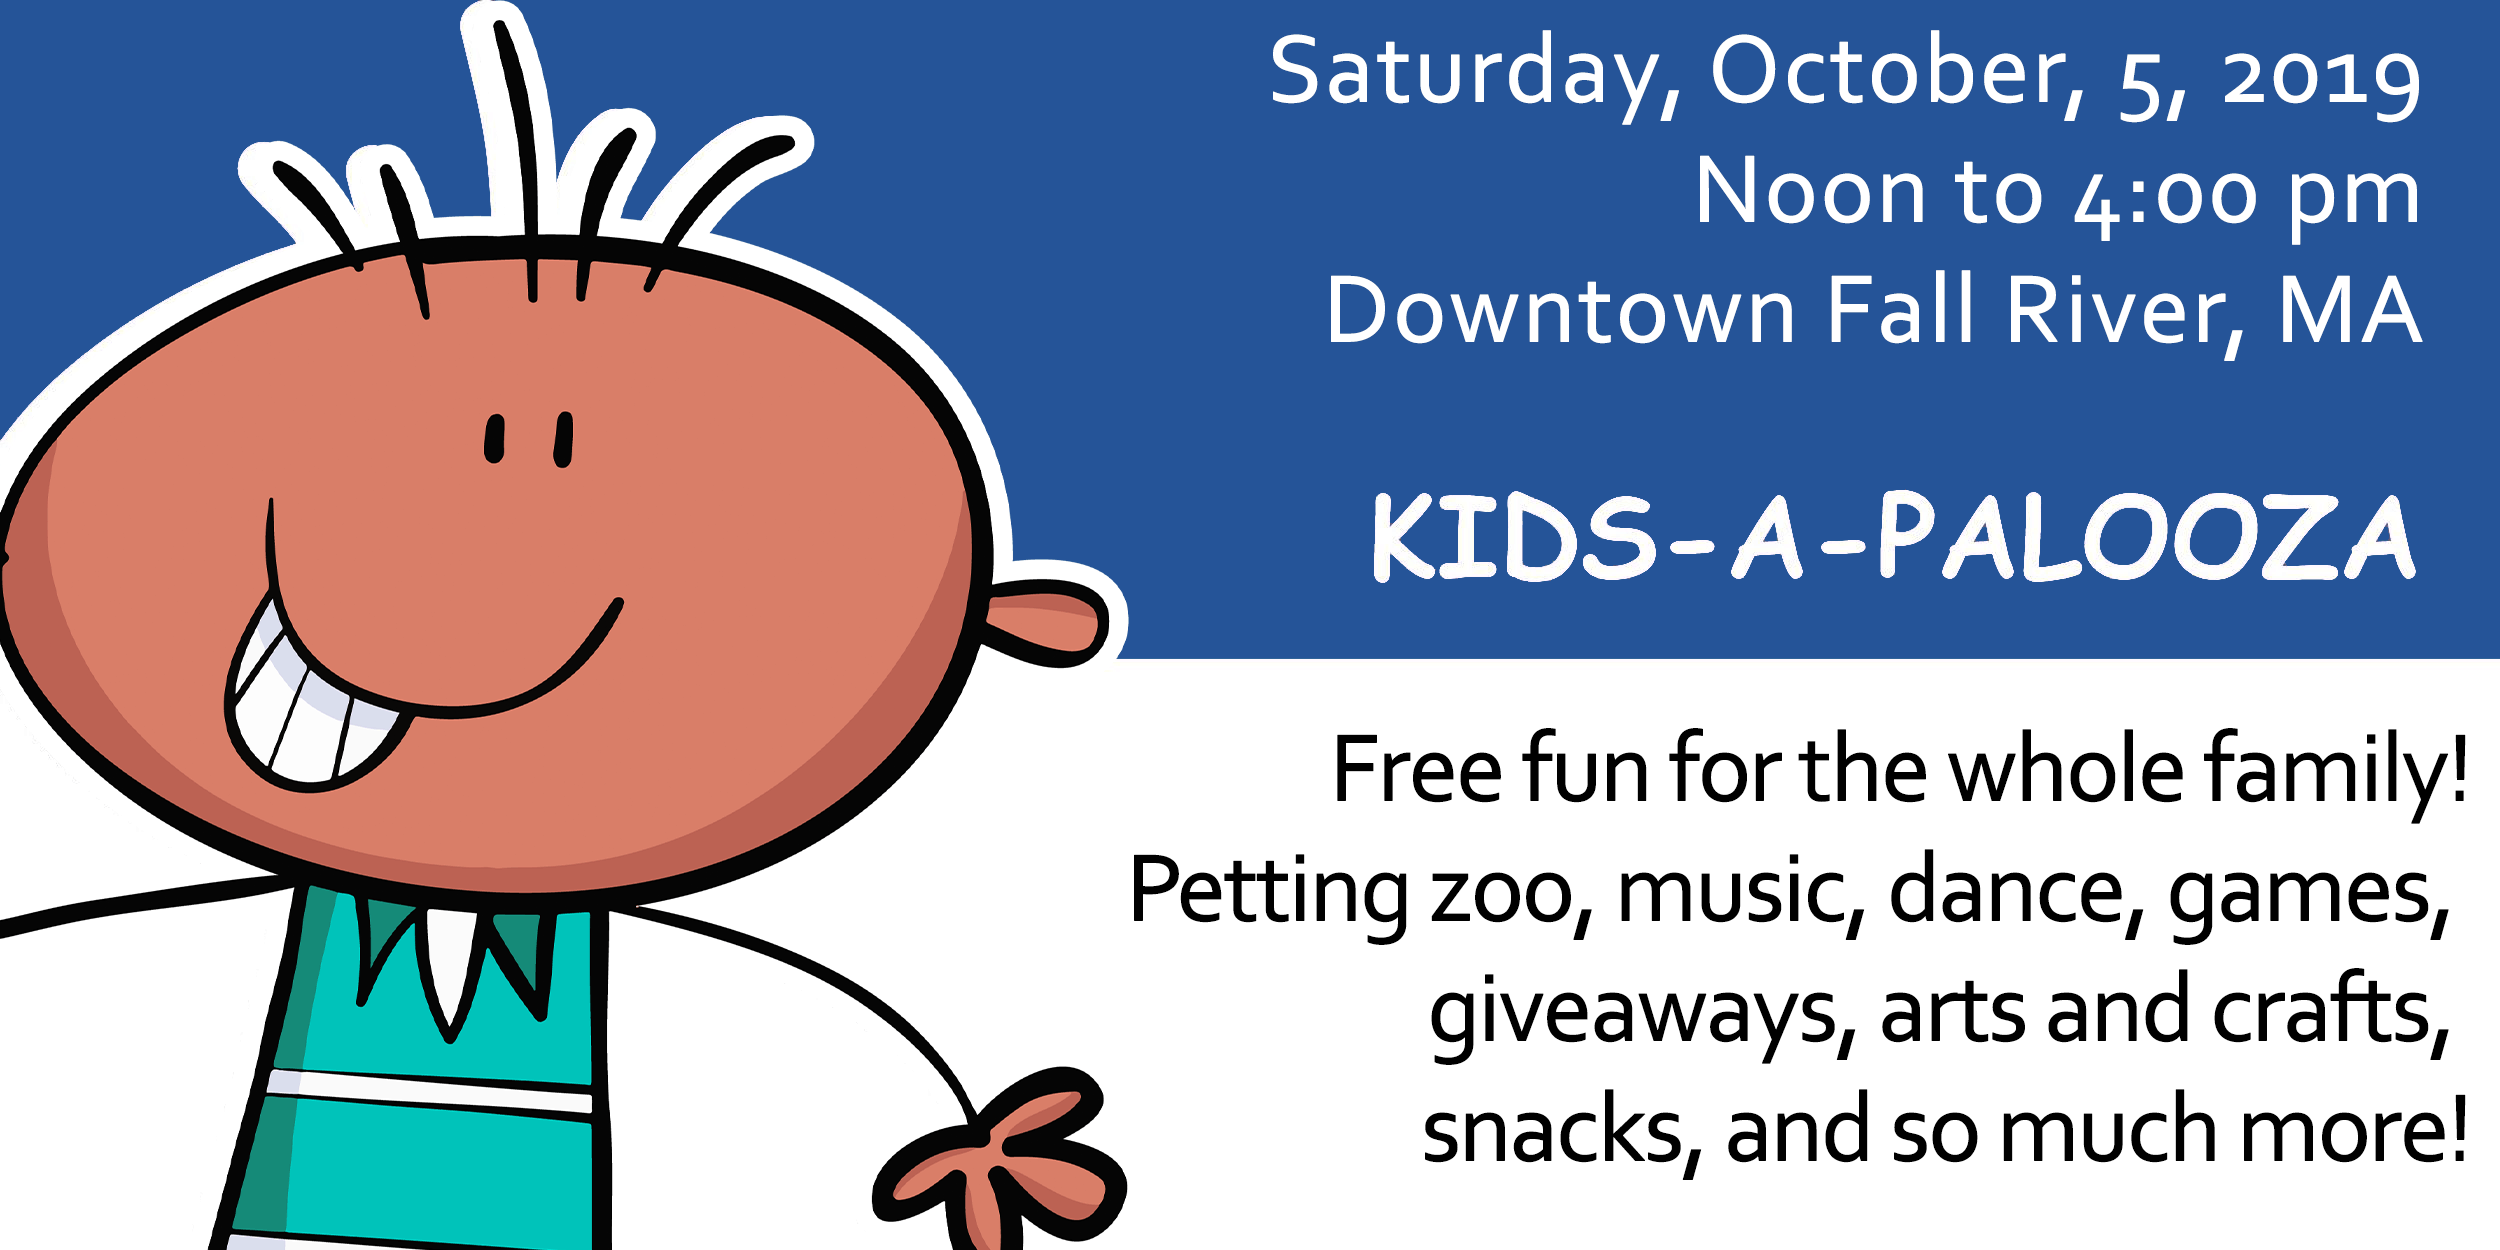 Kids A Palooza event promo